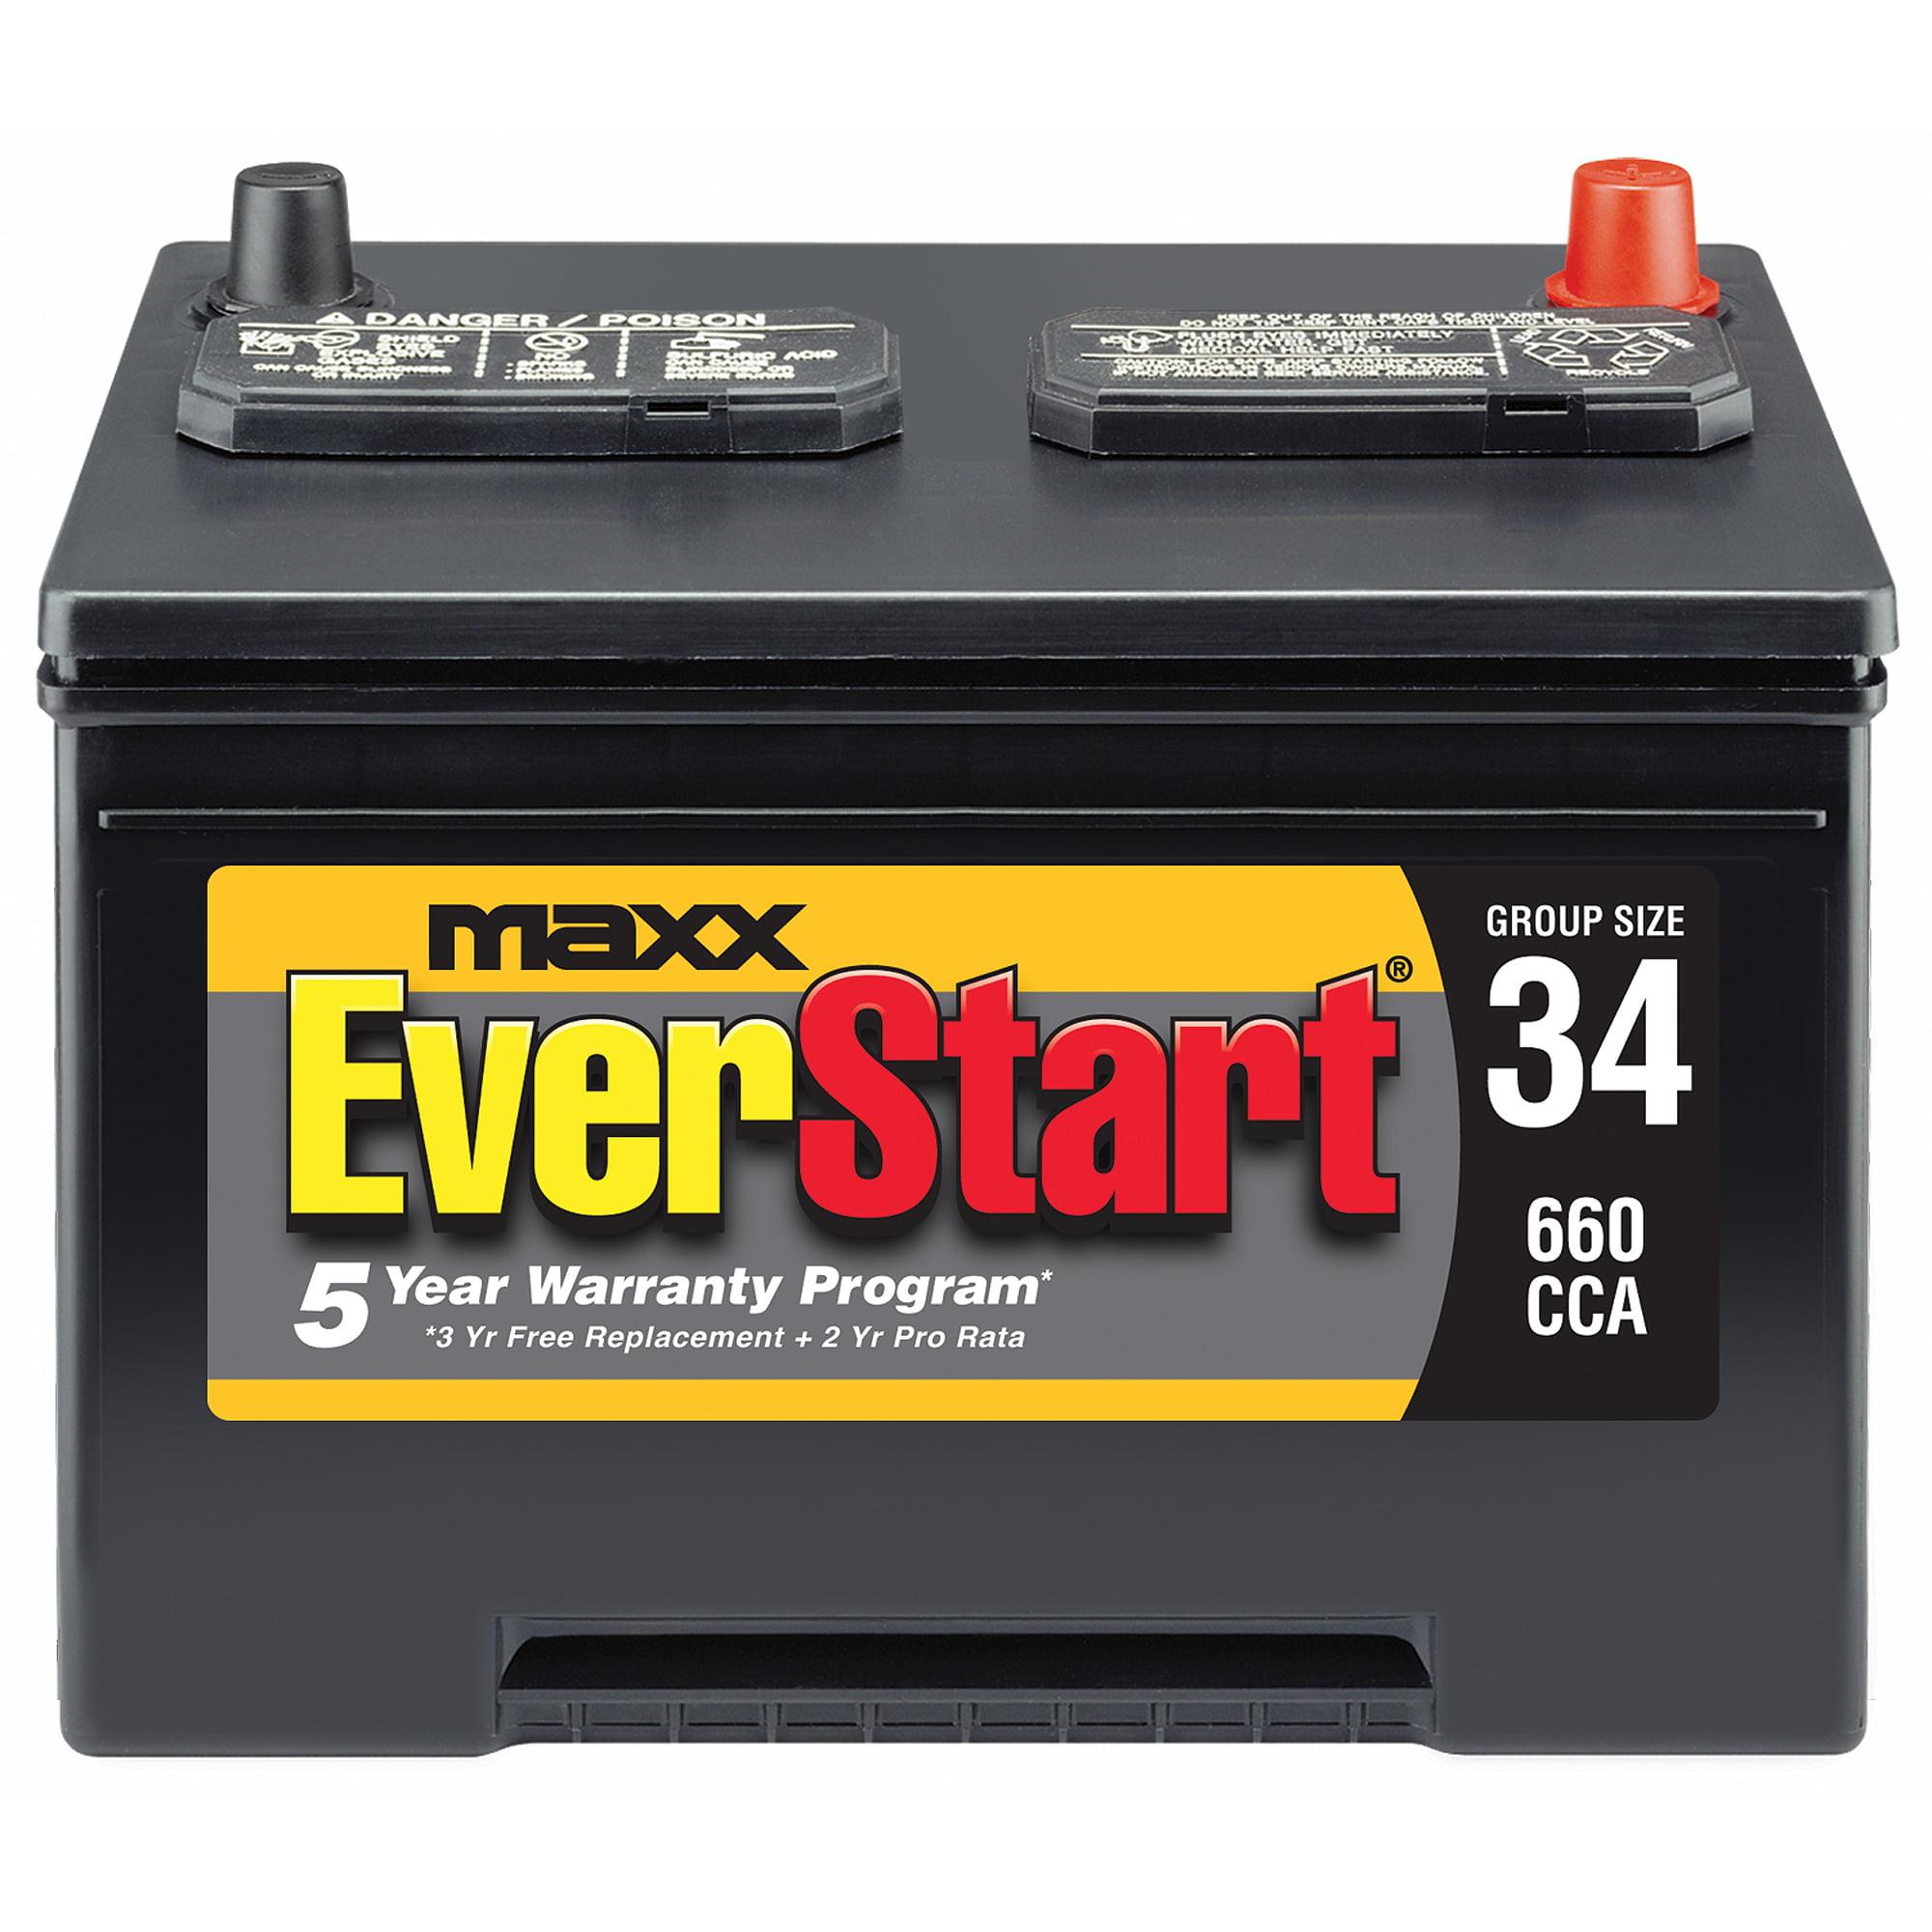 EverStart Maxx Lead Acid Automotive Battery Group 34s Walmart